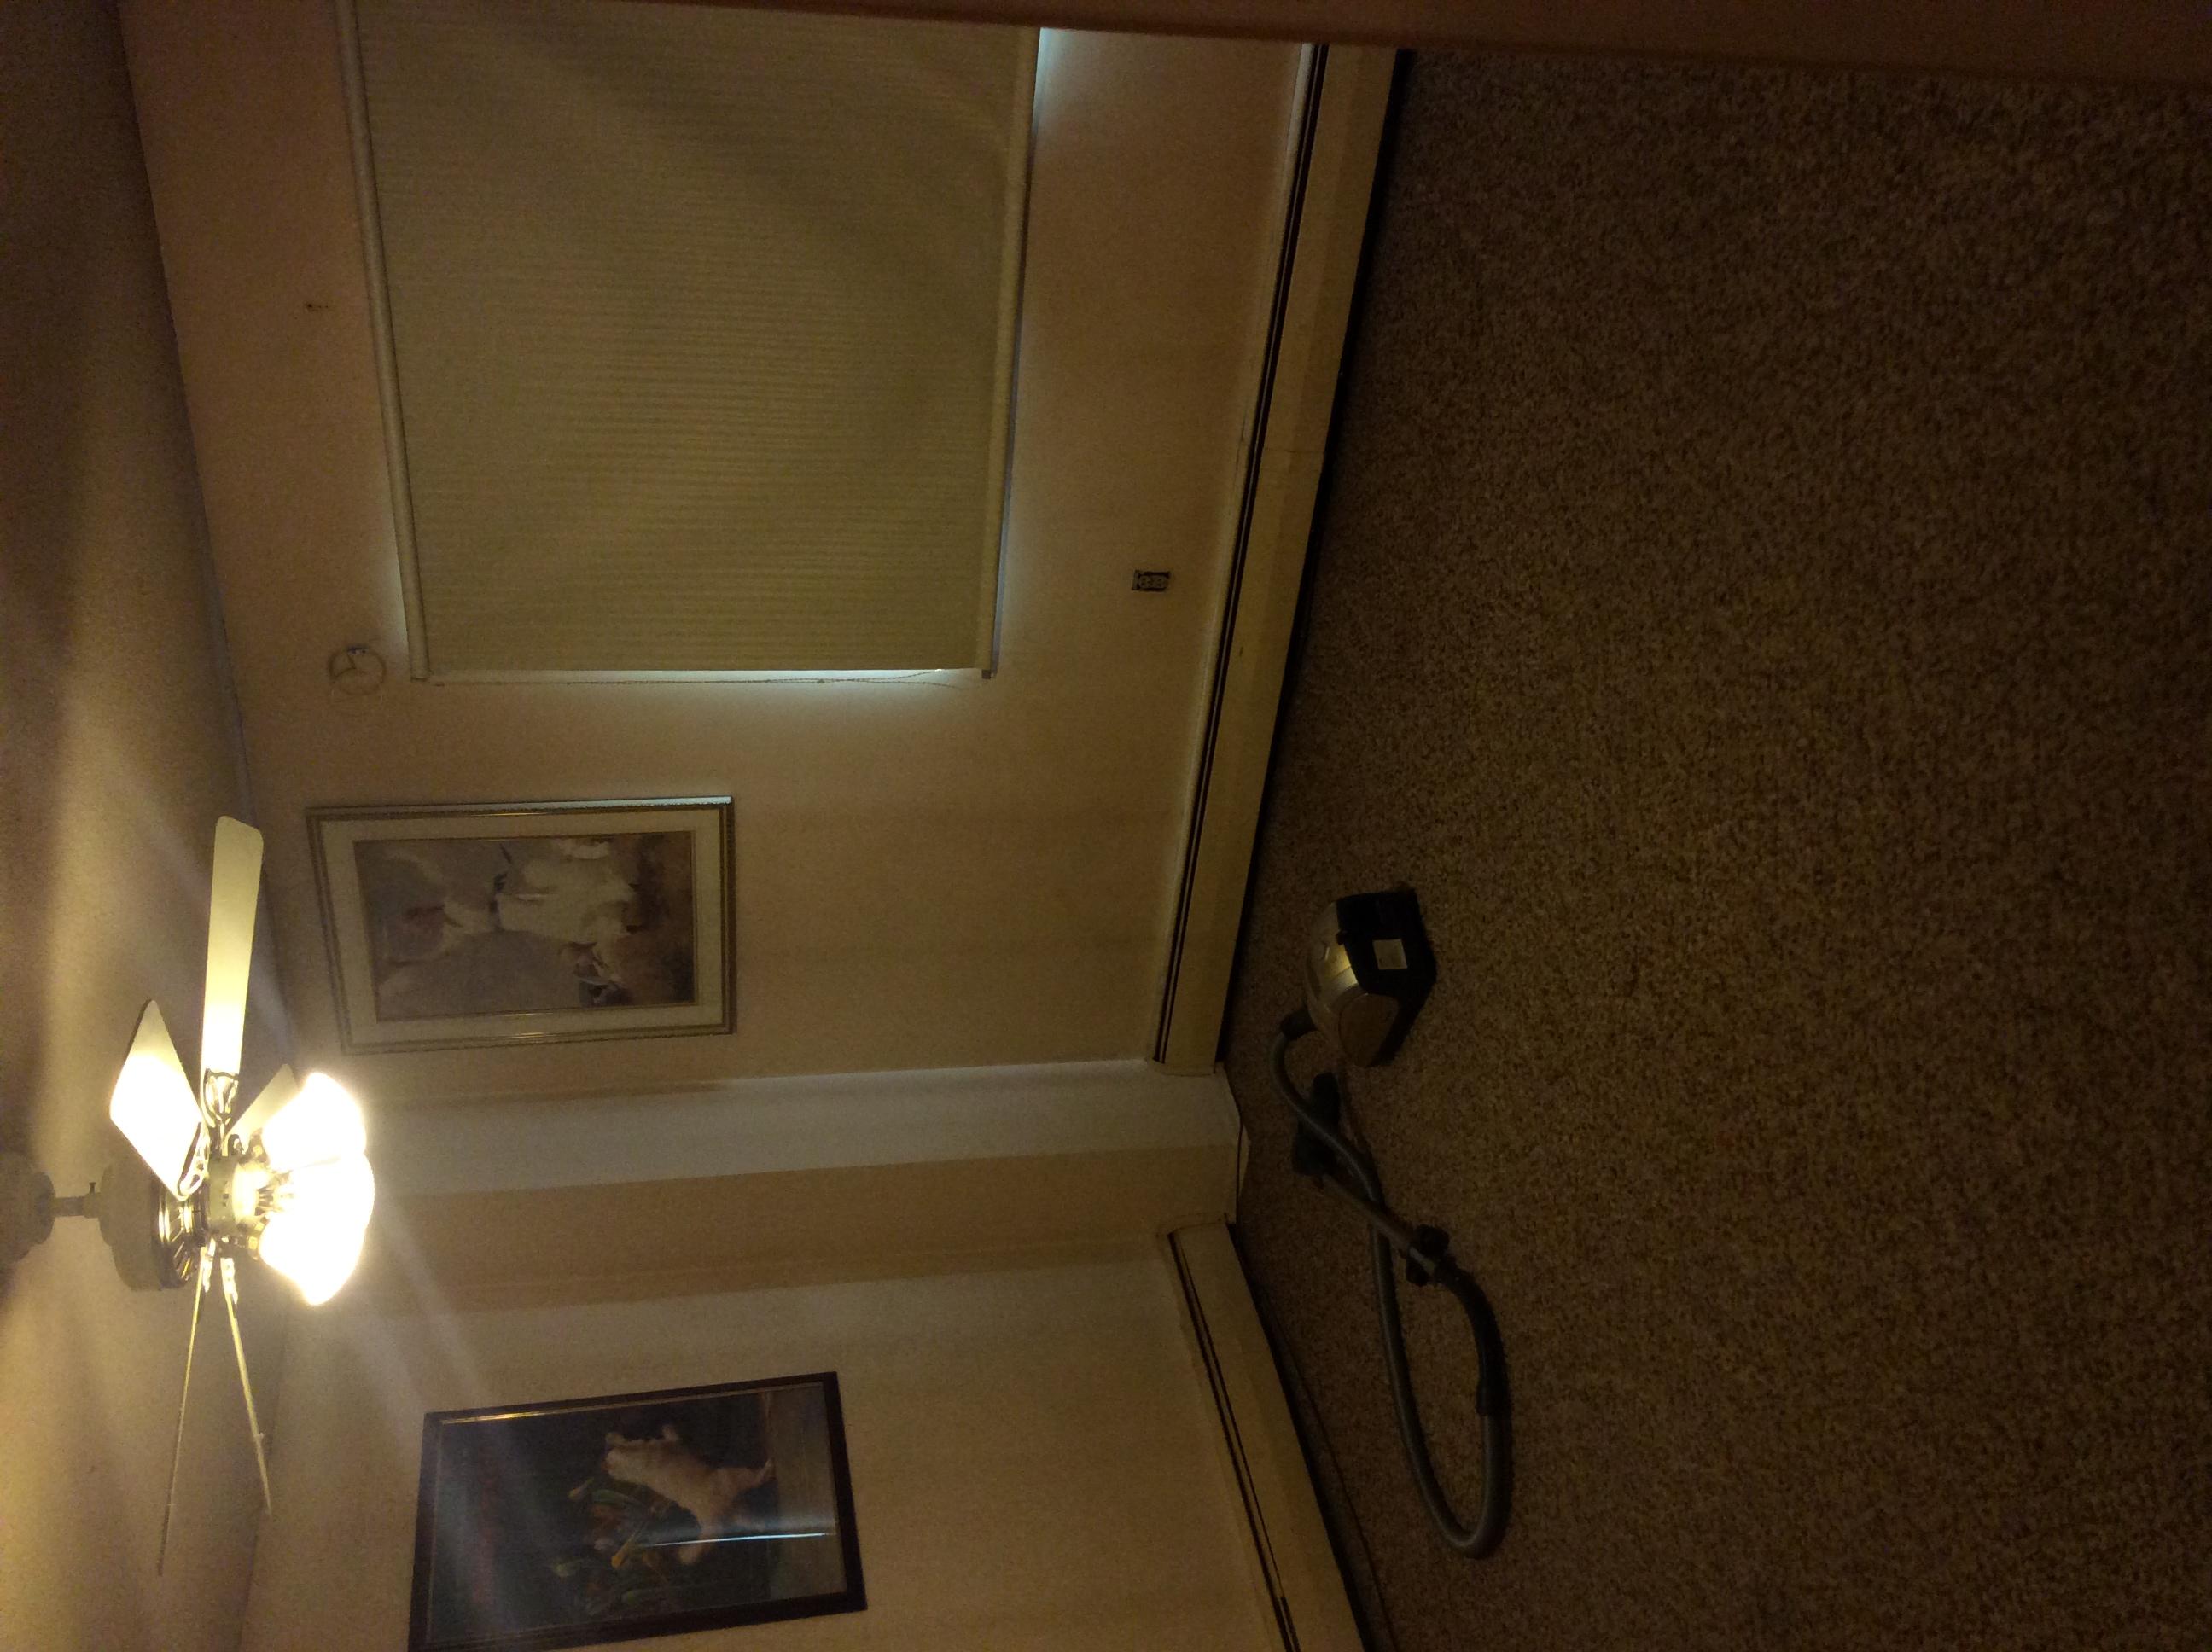 Inglewood+Condo+Bedroom+Window+Before.JPG